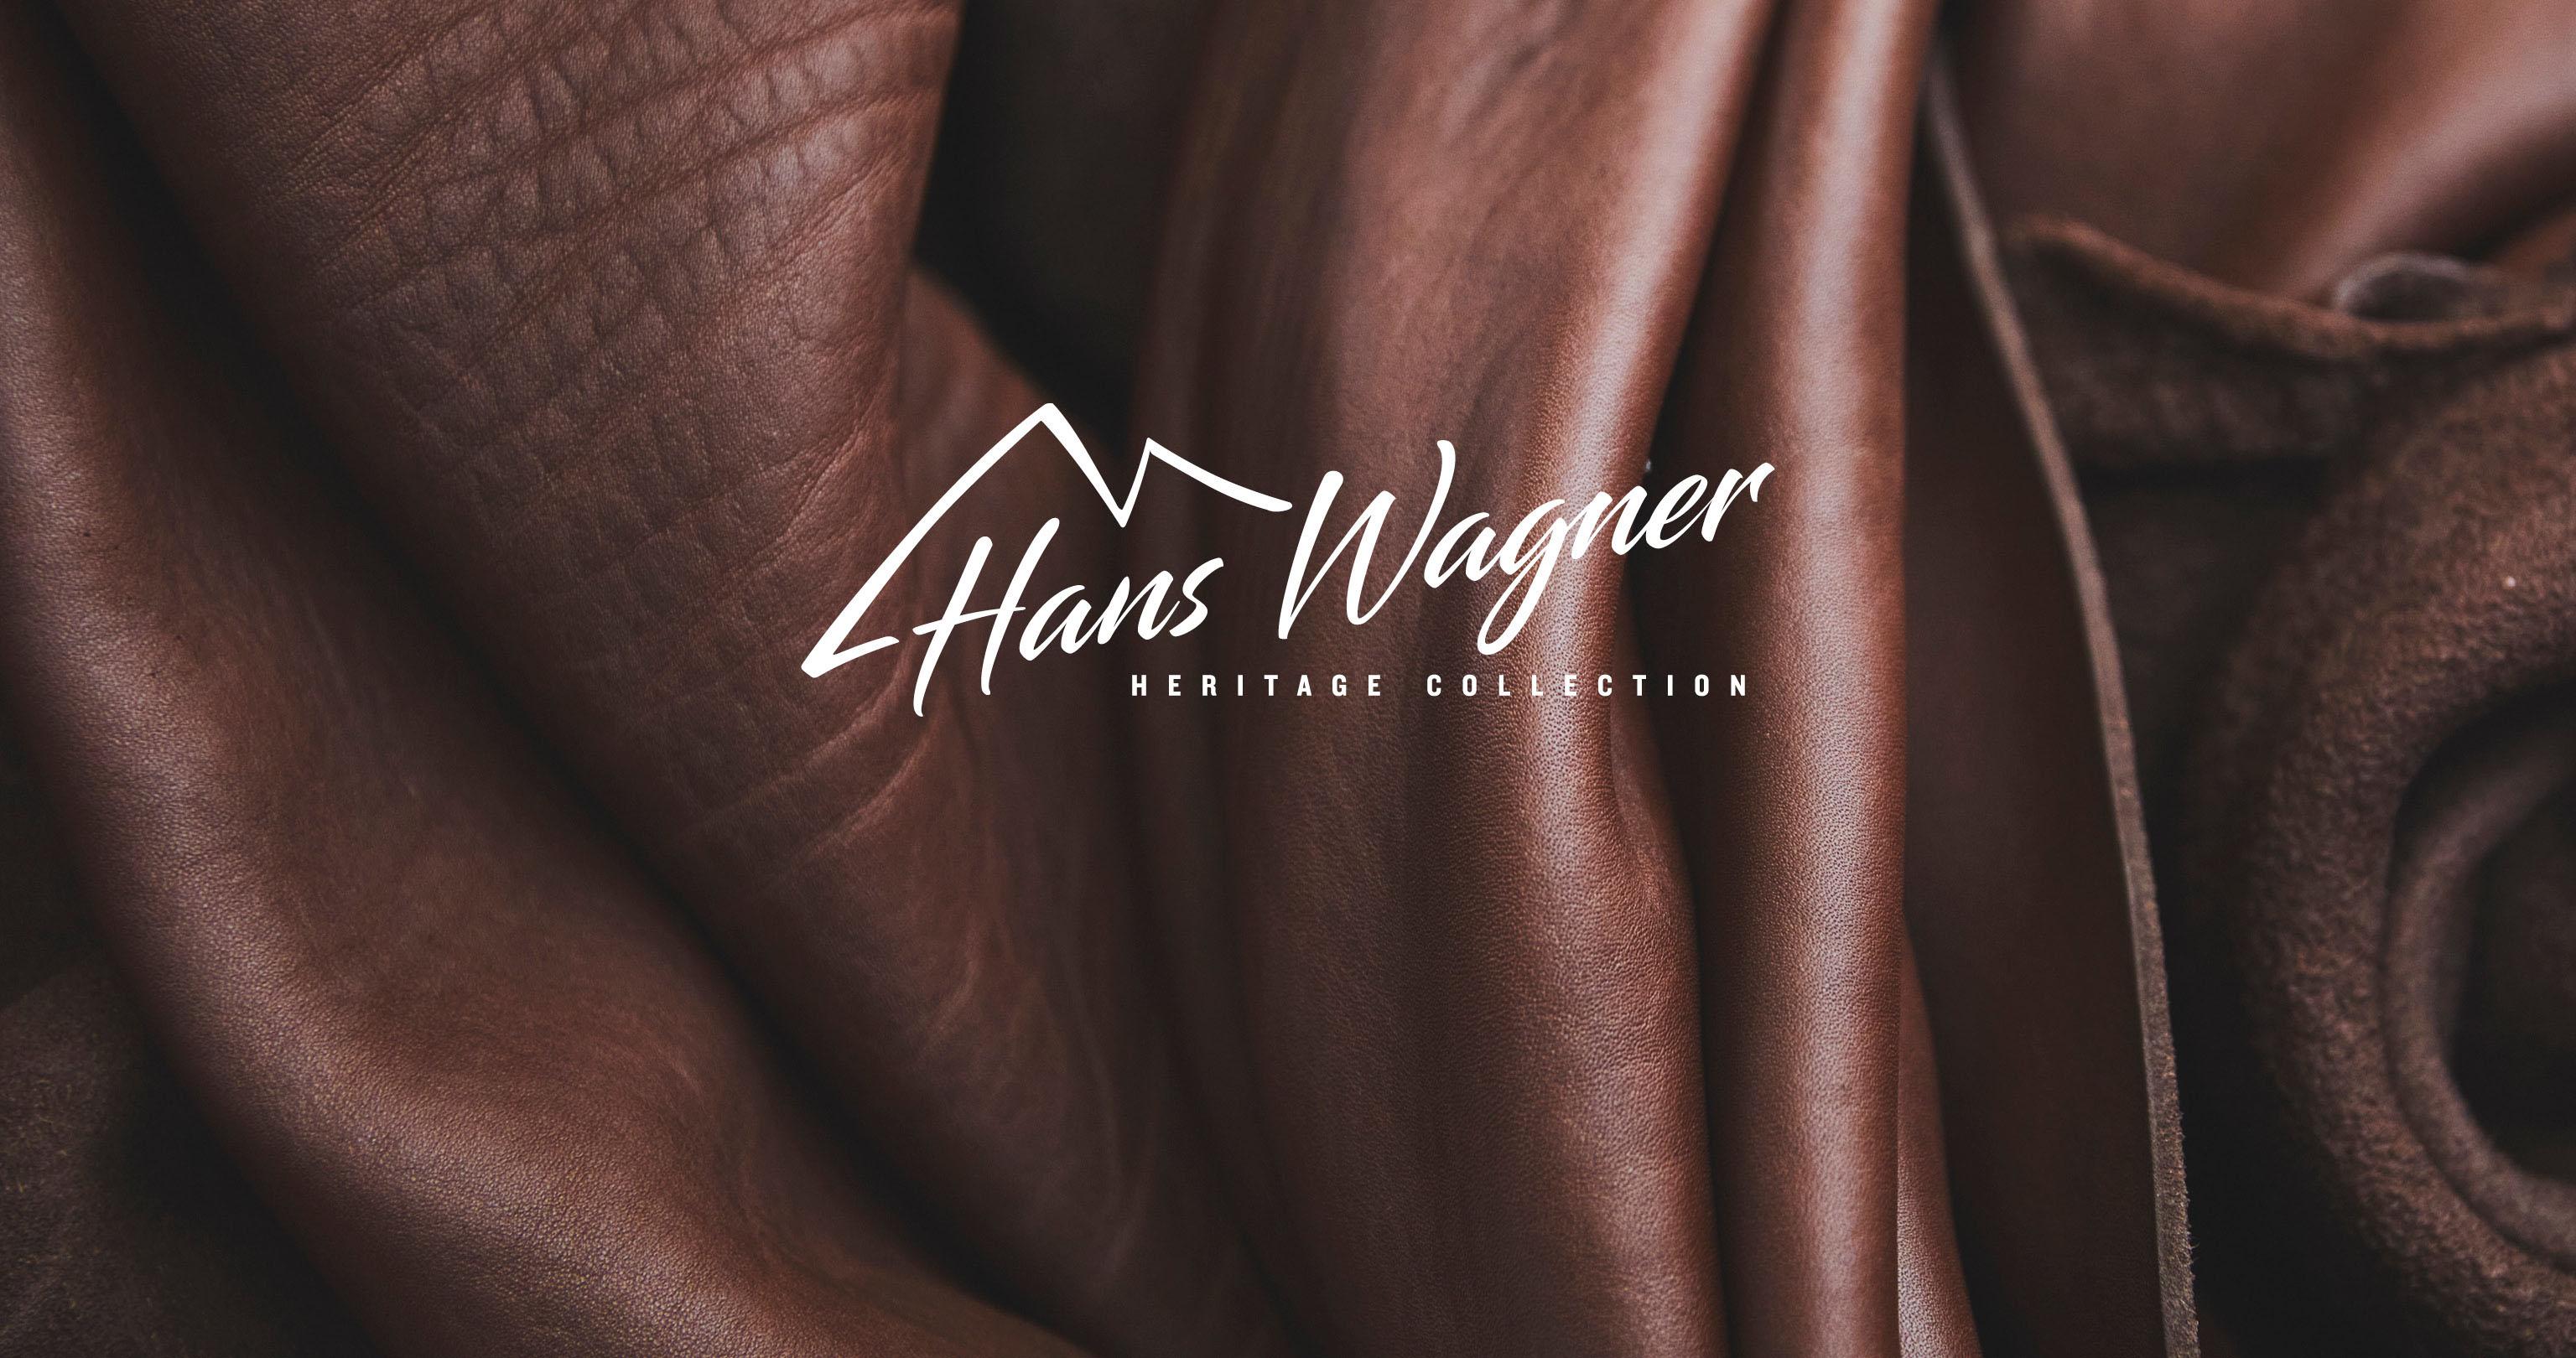 Hanwag Hans Wagner Heritage Collection Key Visual